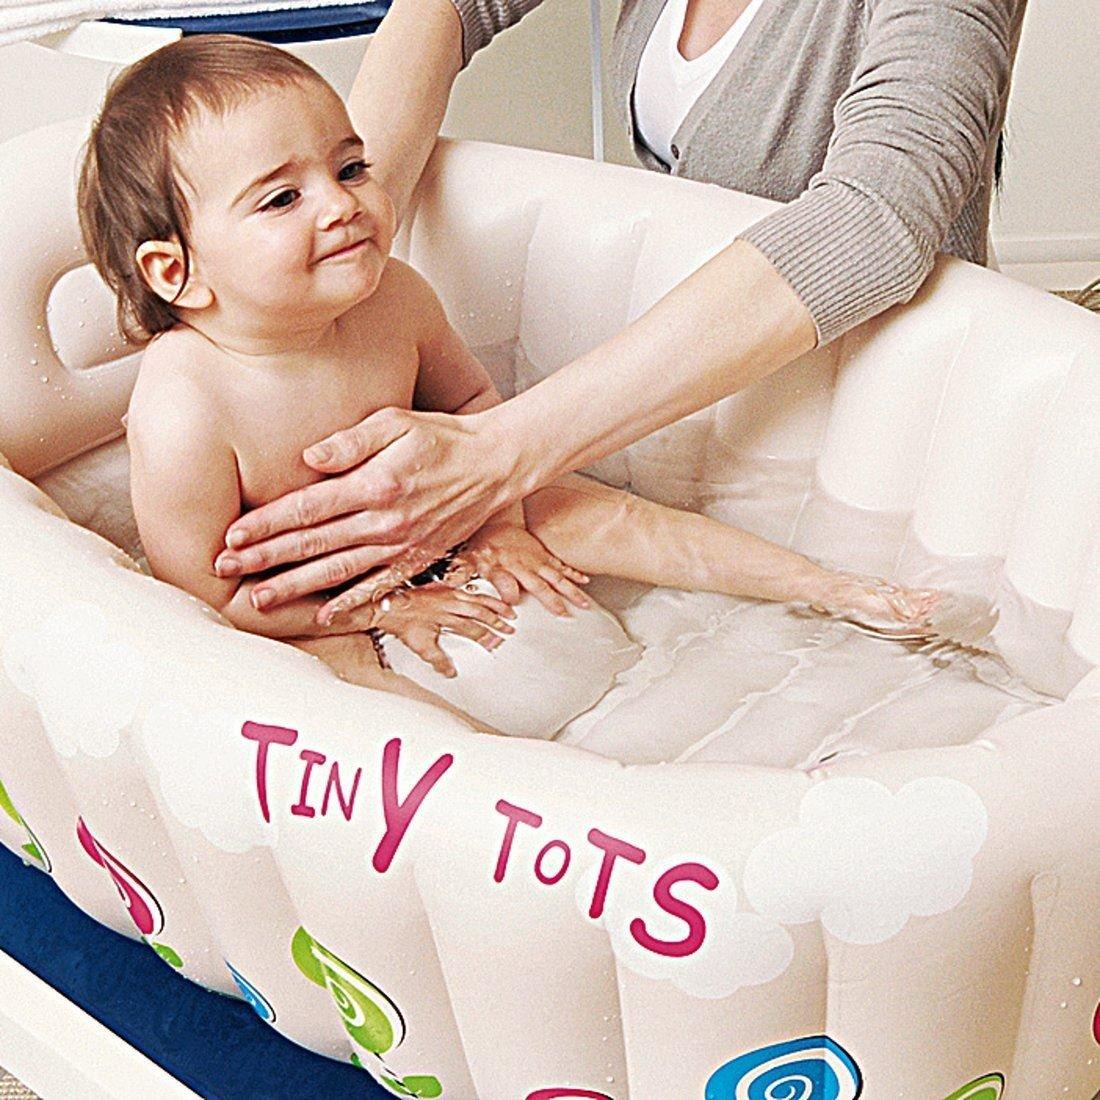 TINY TOTS INFLATABLE BABY HOT BATH HEAT SENSOR WASHING TRAVEL TUB